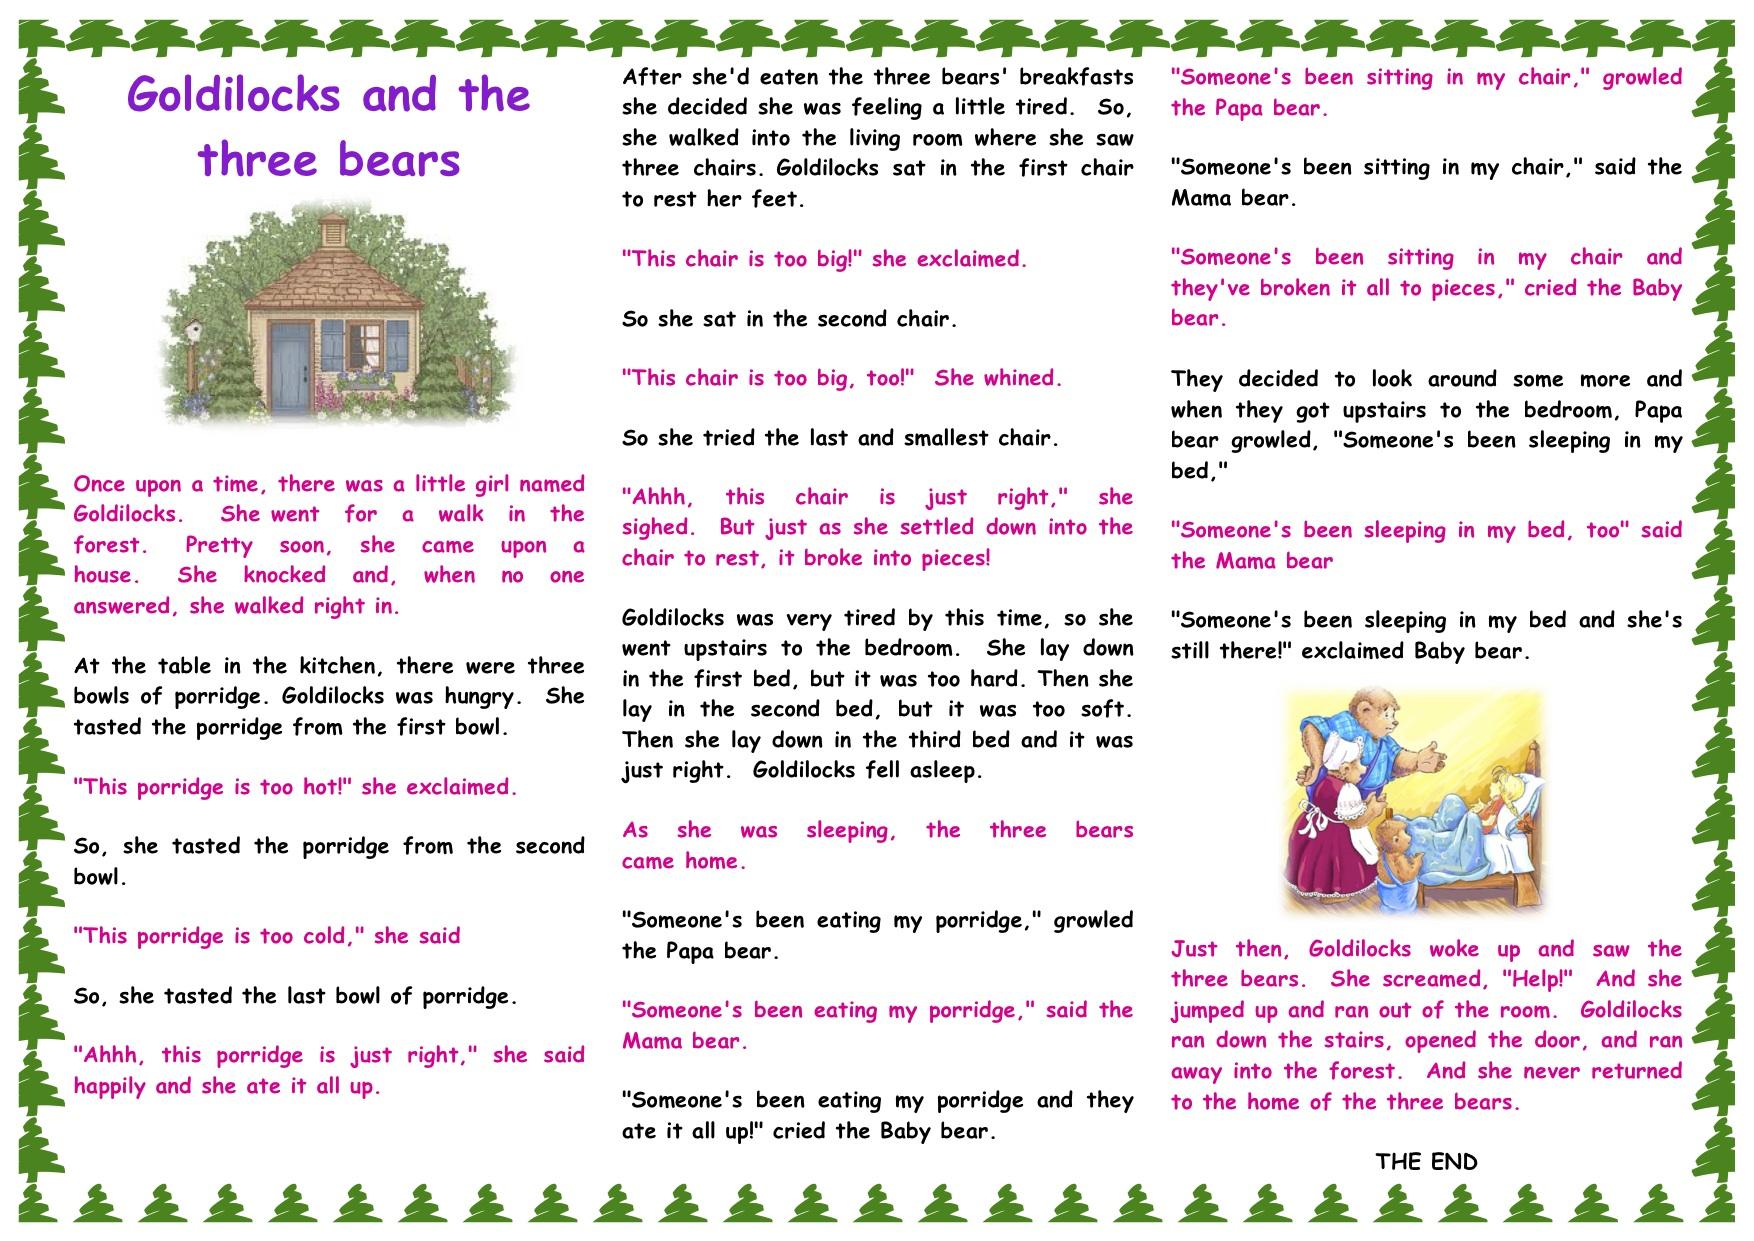 goldilocks and the three bears story pdf